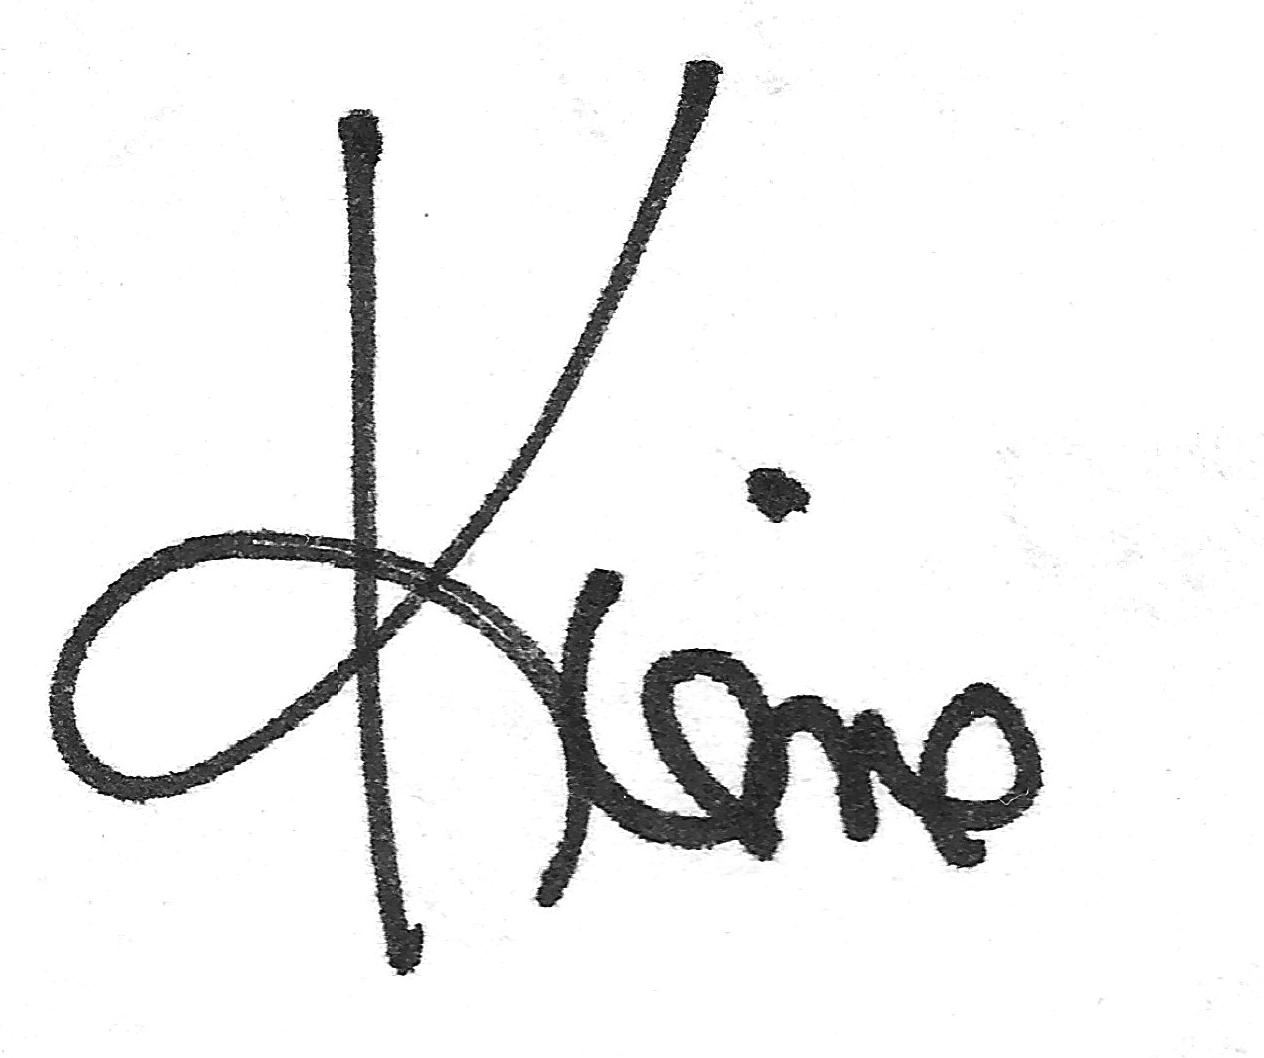 Kiene's Signature